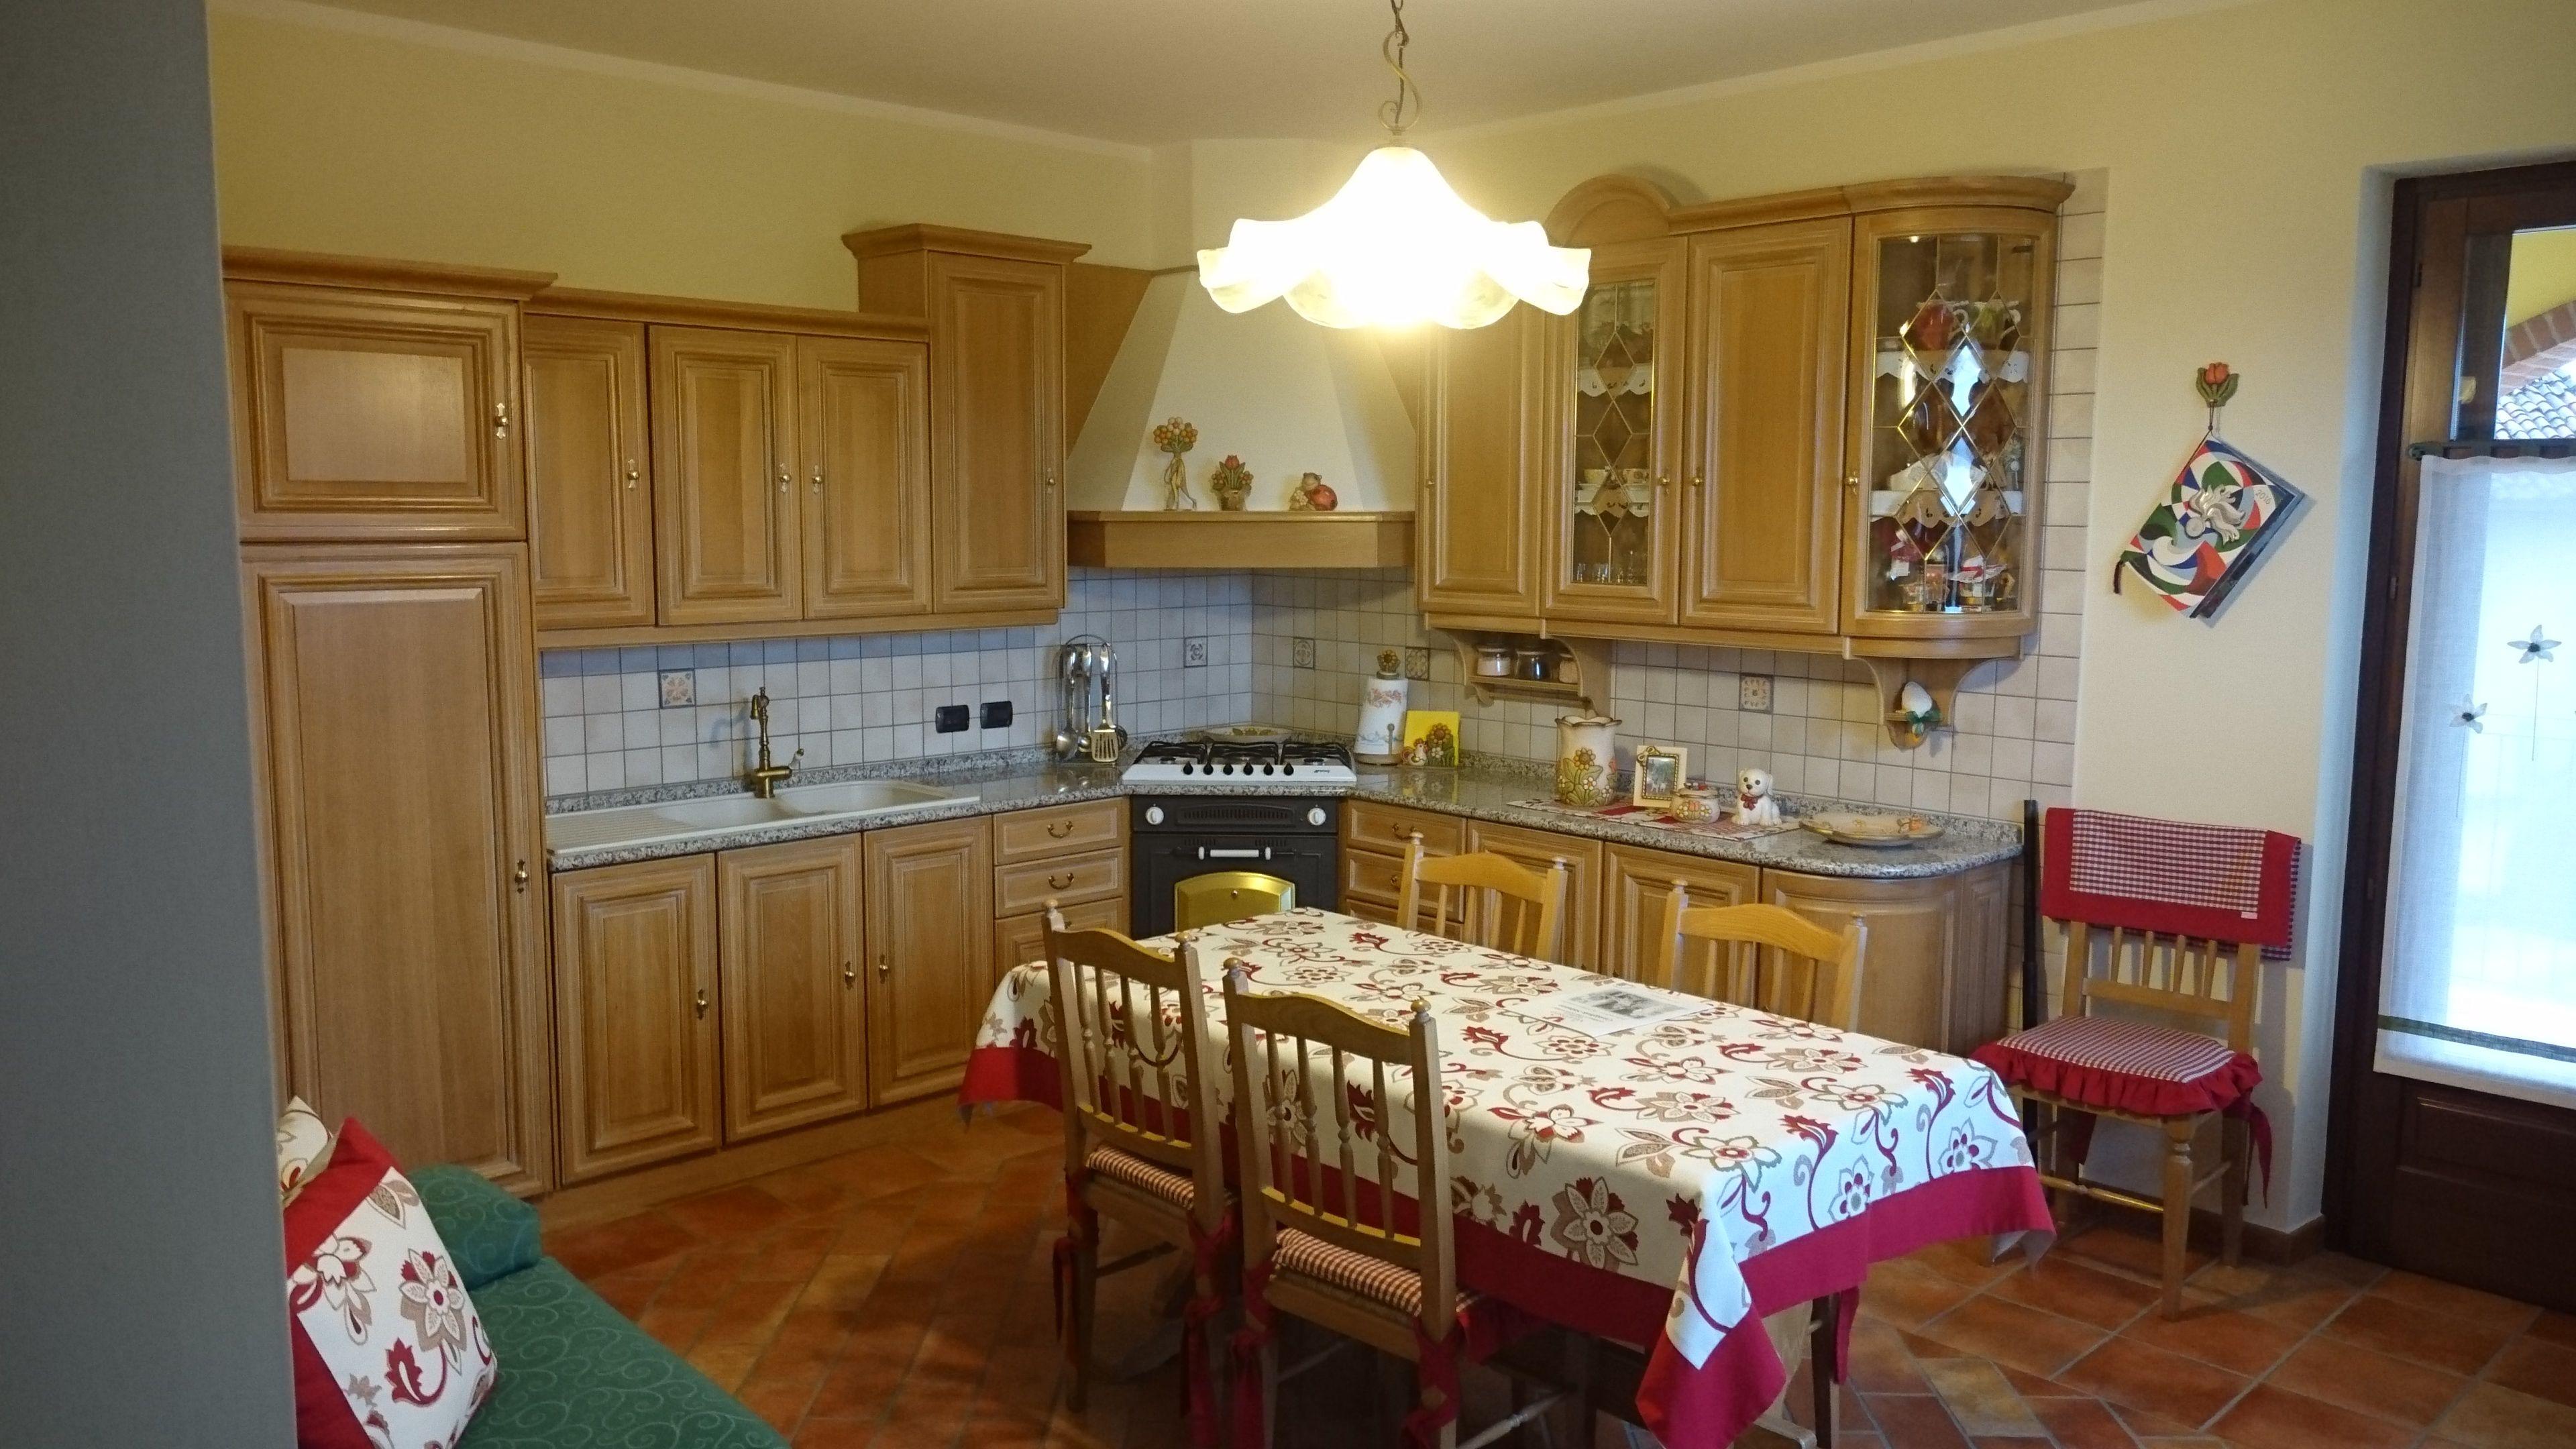 125 Mobili Cucina Regalo - regalo mobili cucina ladispoli ...